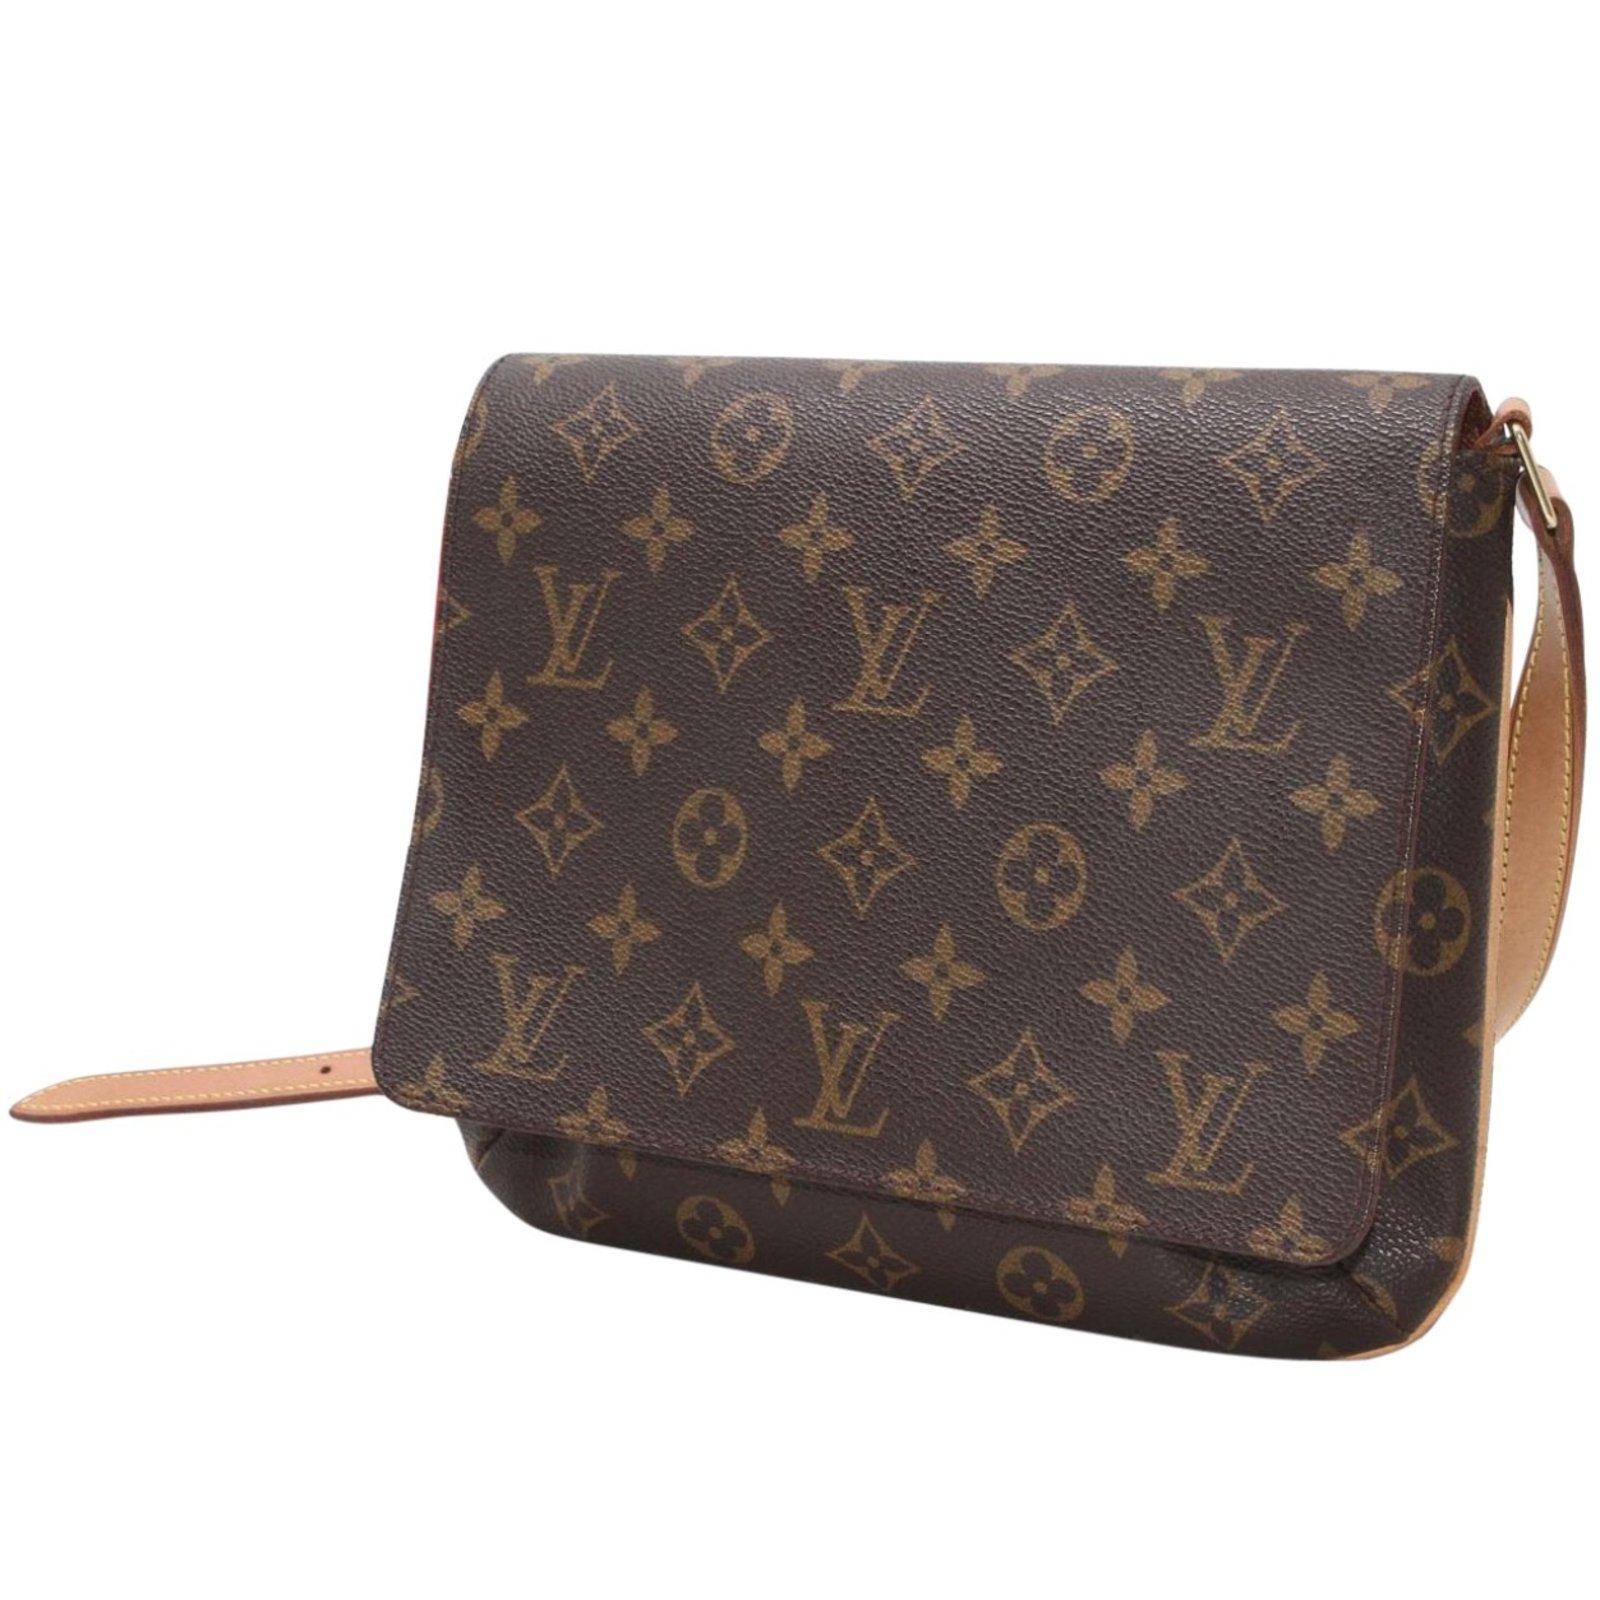 7ebf97a80db0 Louis Vuitton Handbags Handbags Leather Brown ref.11819 - Joli Closet